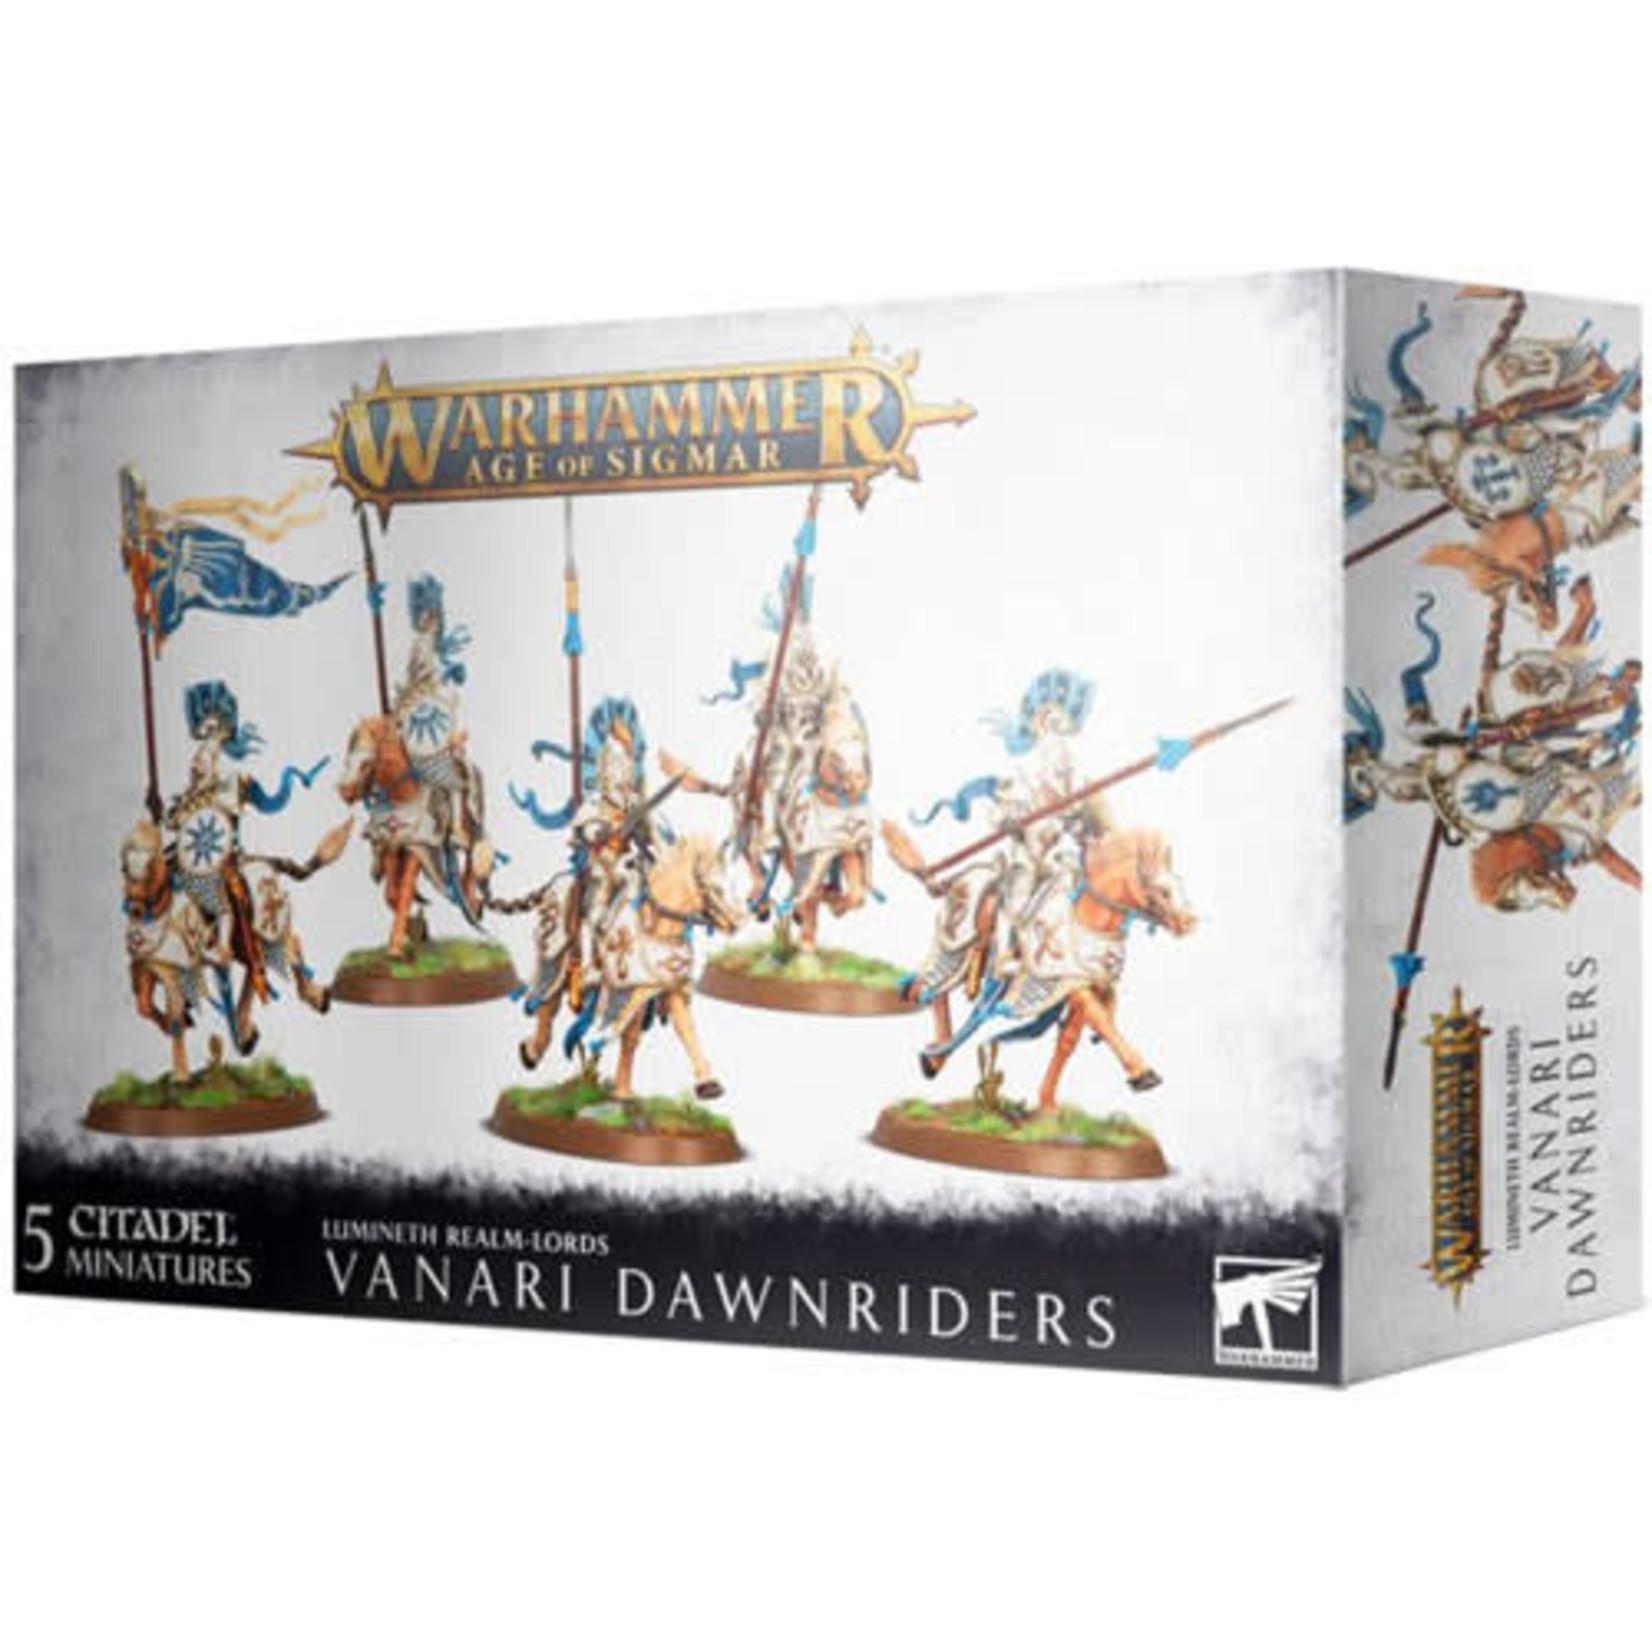 Lumineth Realm Lords Vanari Dawnriders (AOS)